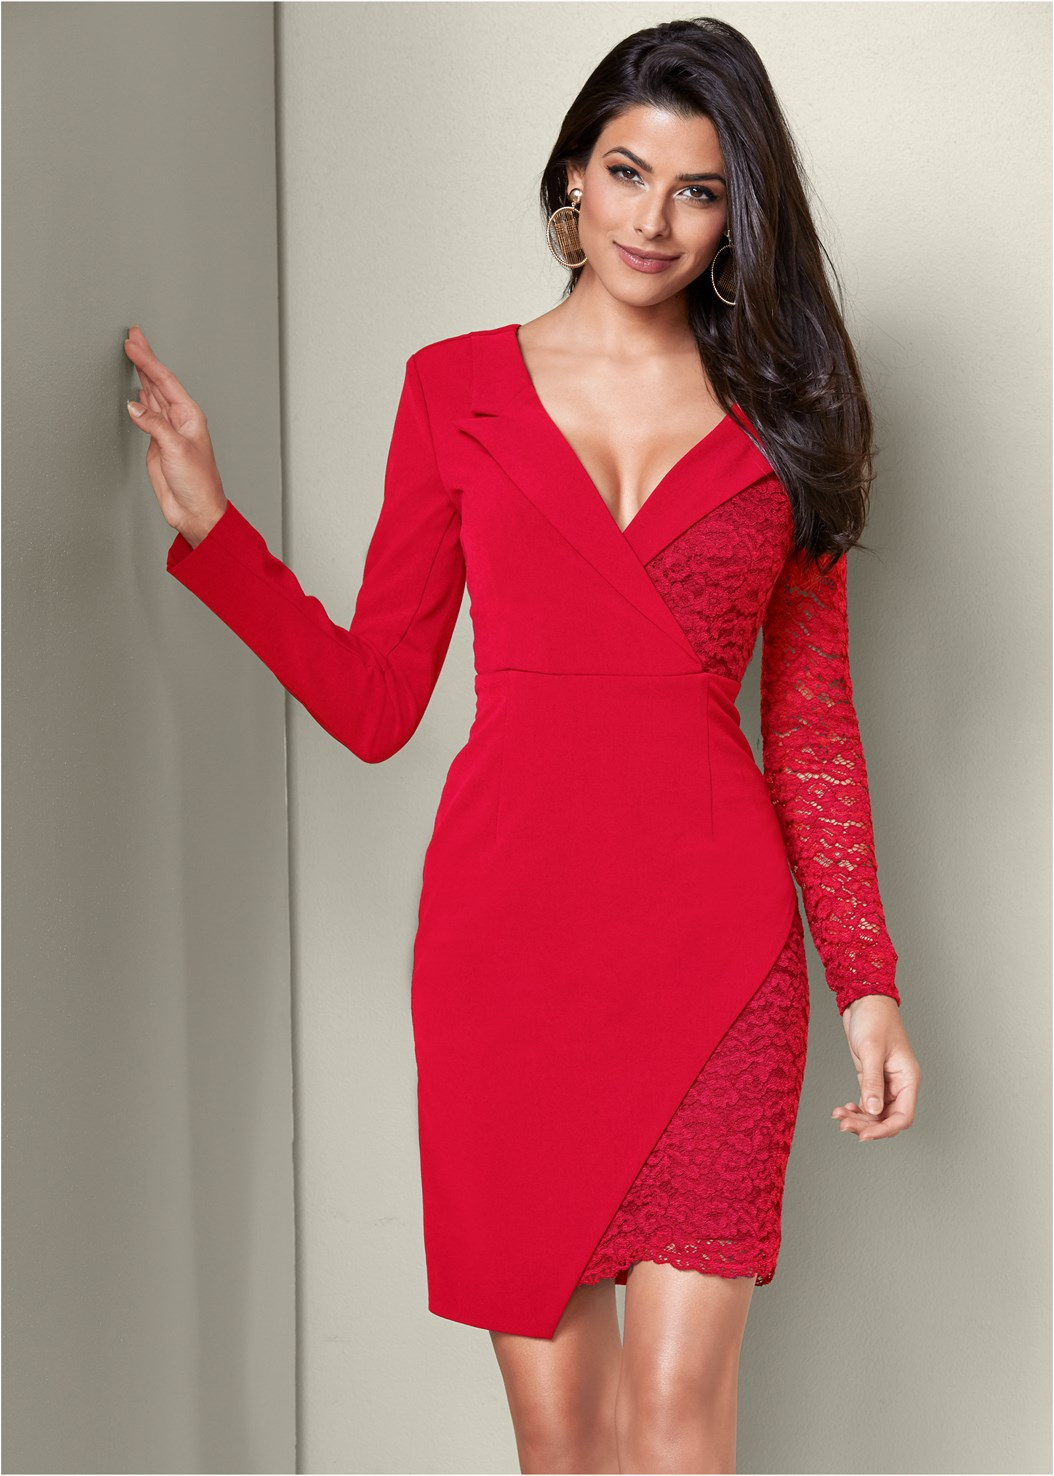 Lace Surplice Detail Dress,Buckle Detail Strappy Heels